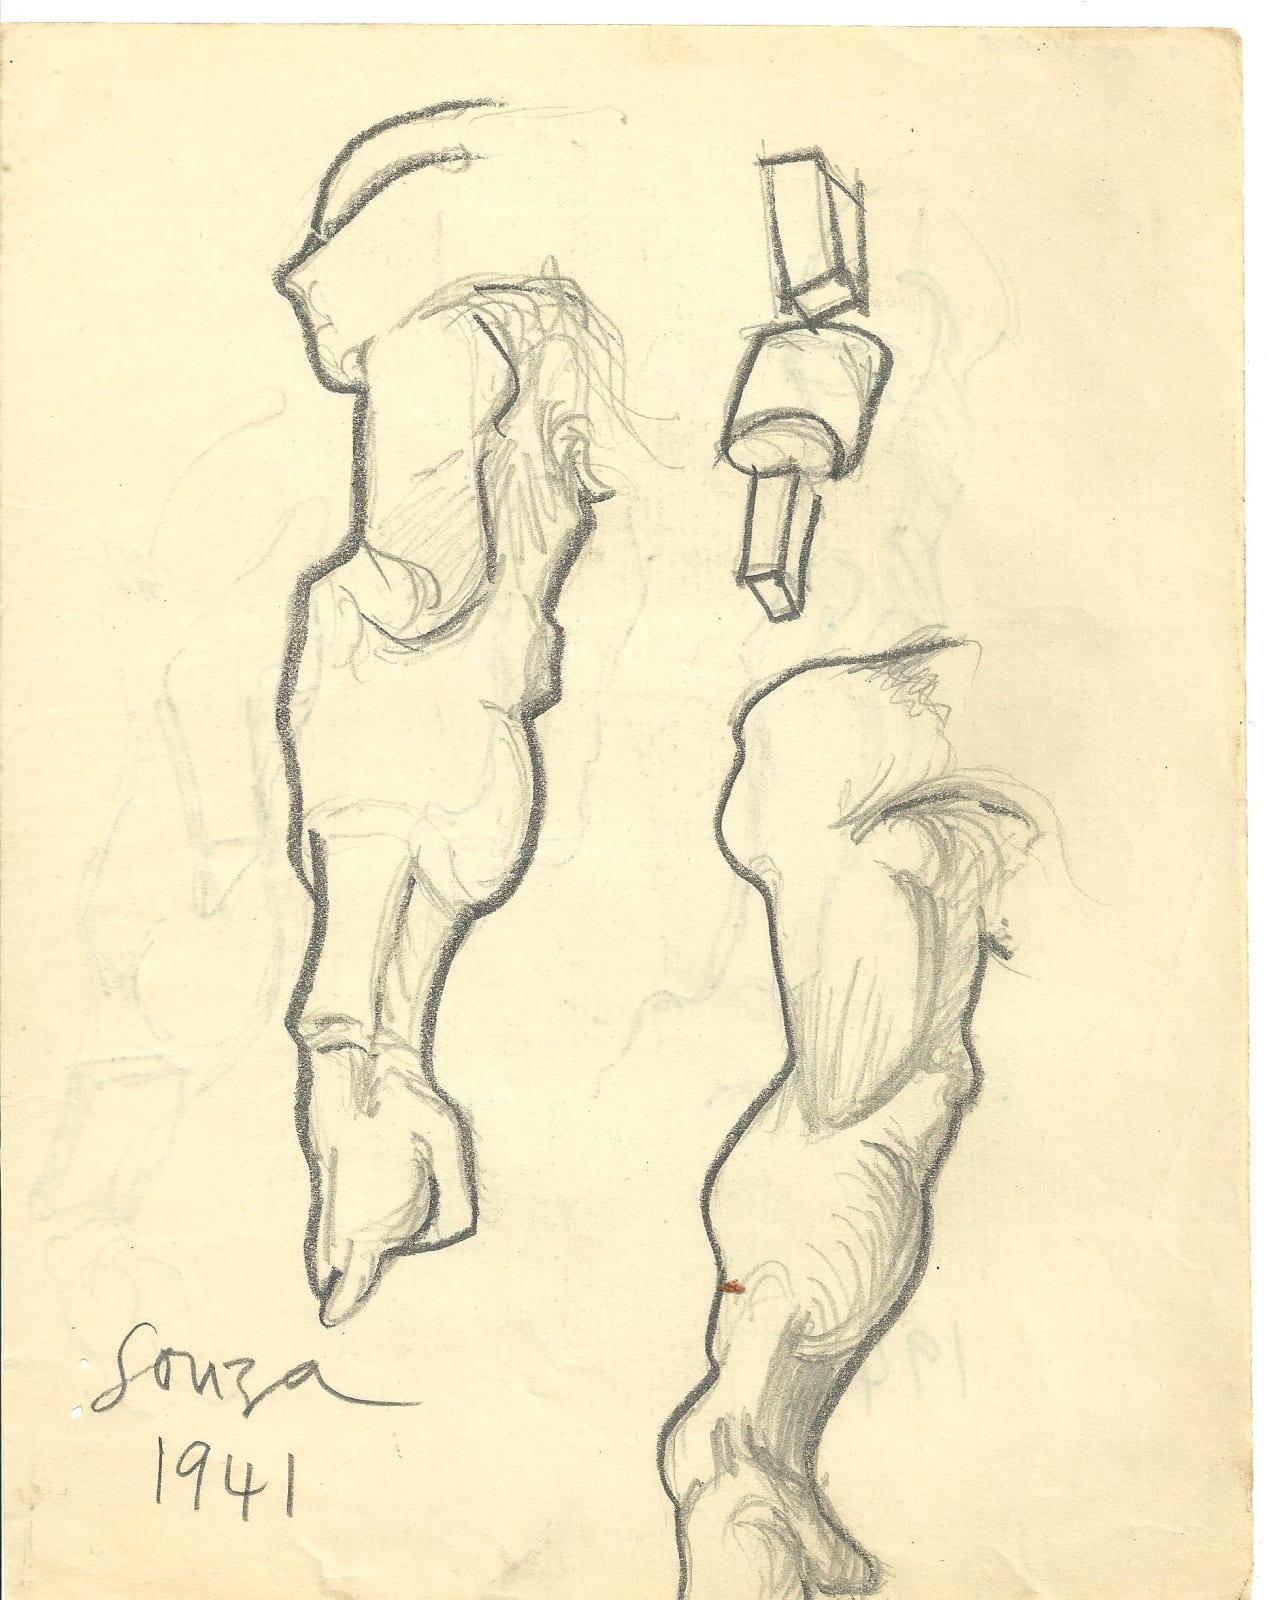 Francis Newton Souza, Untitled (Study), 1941